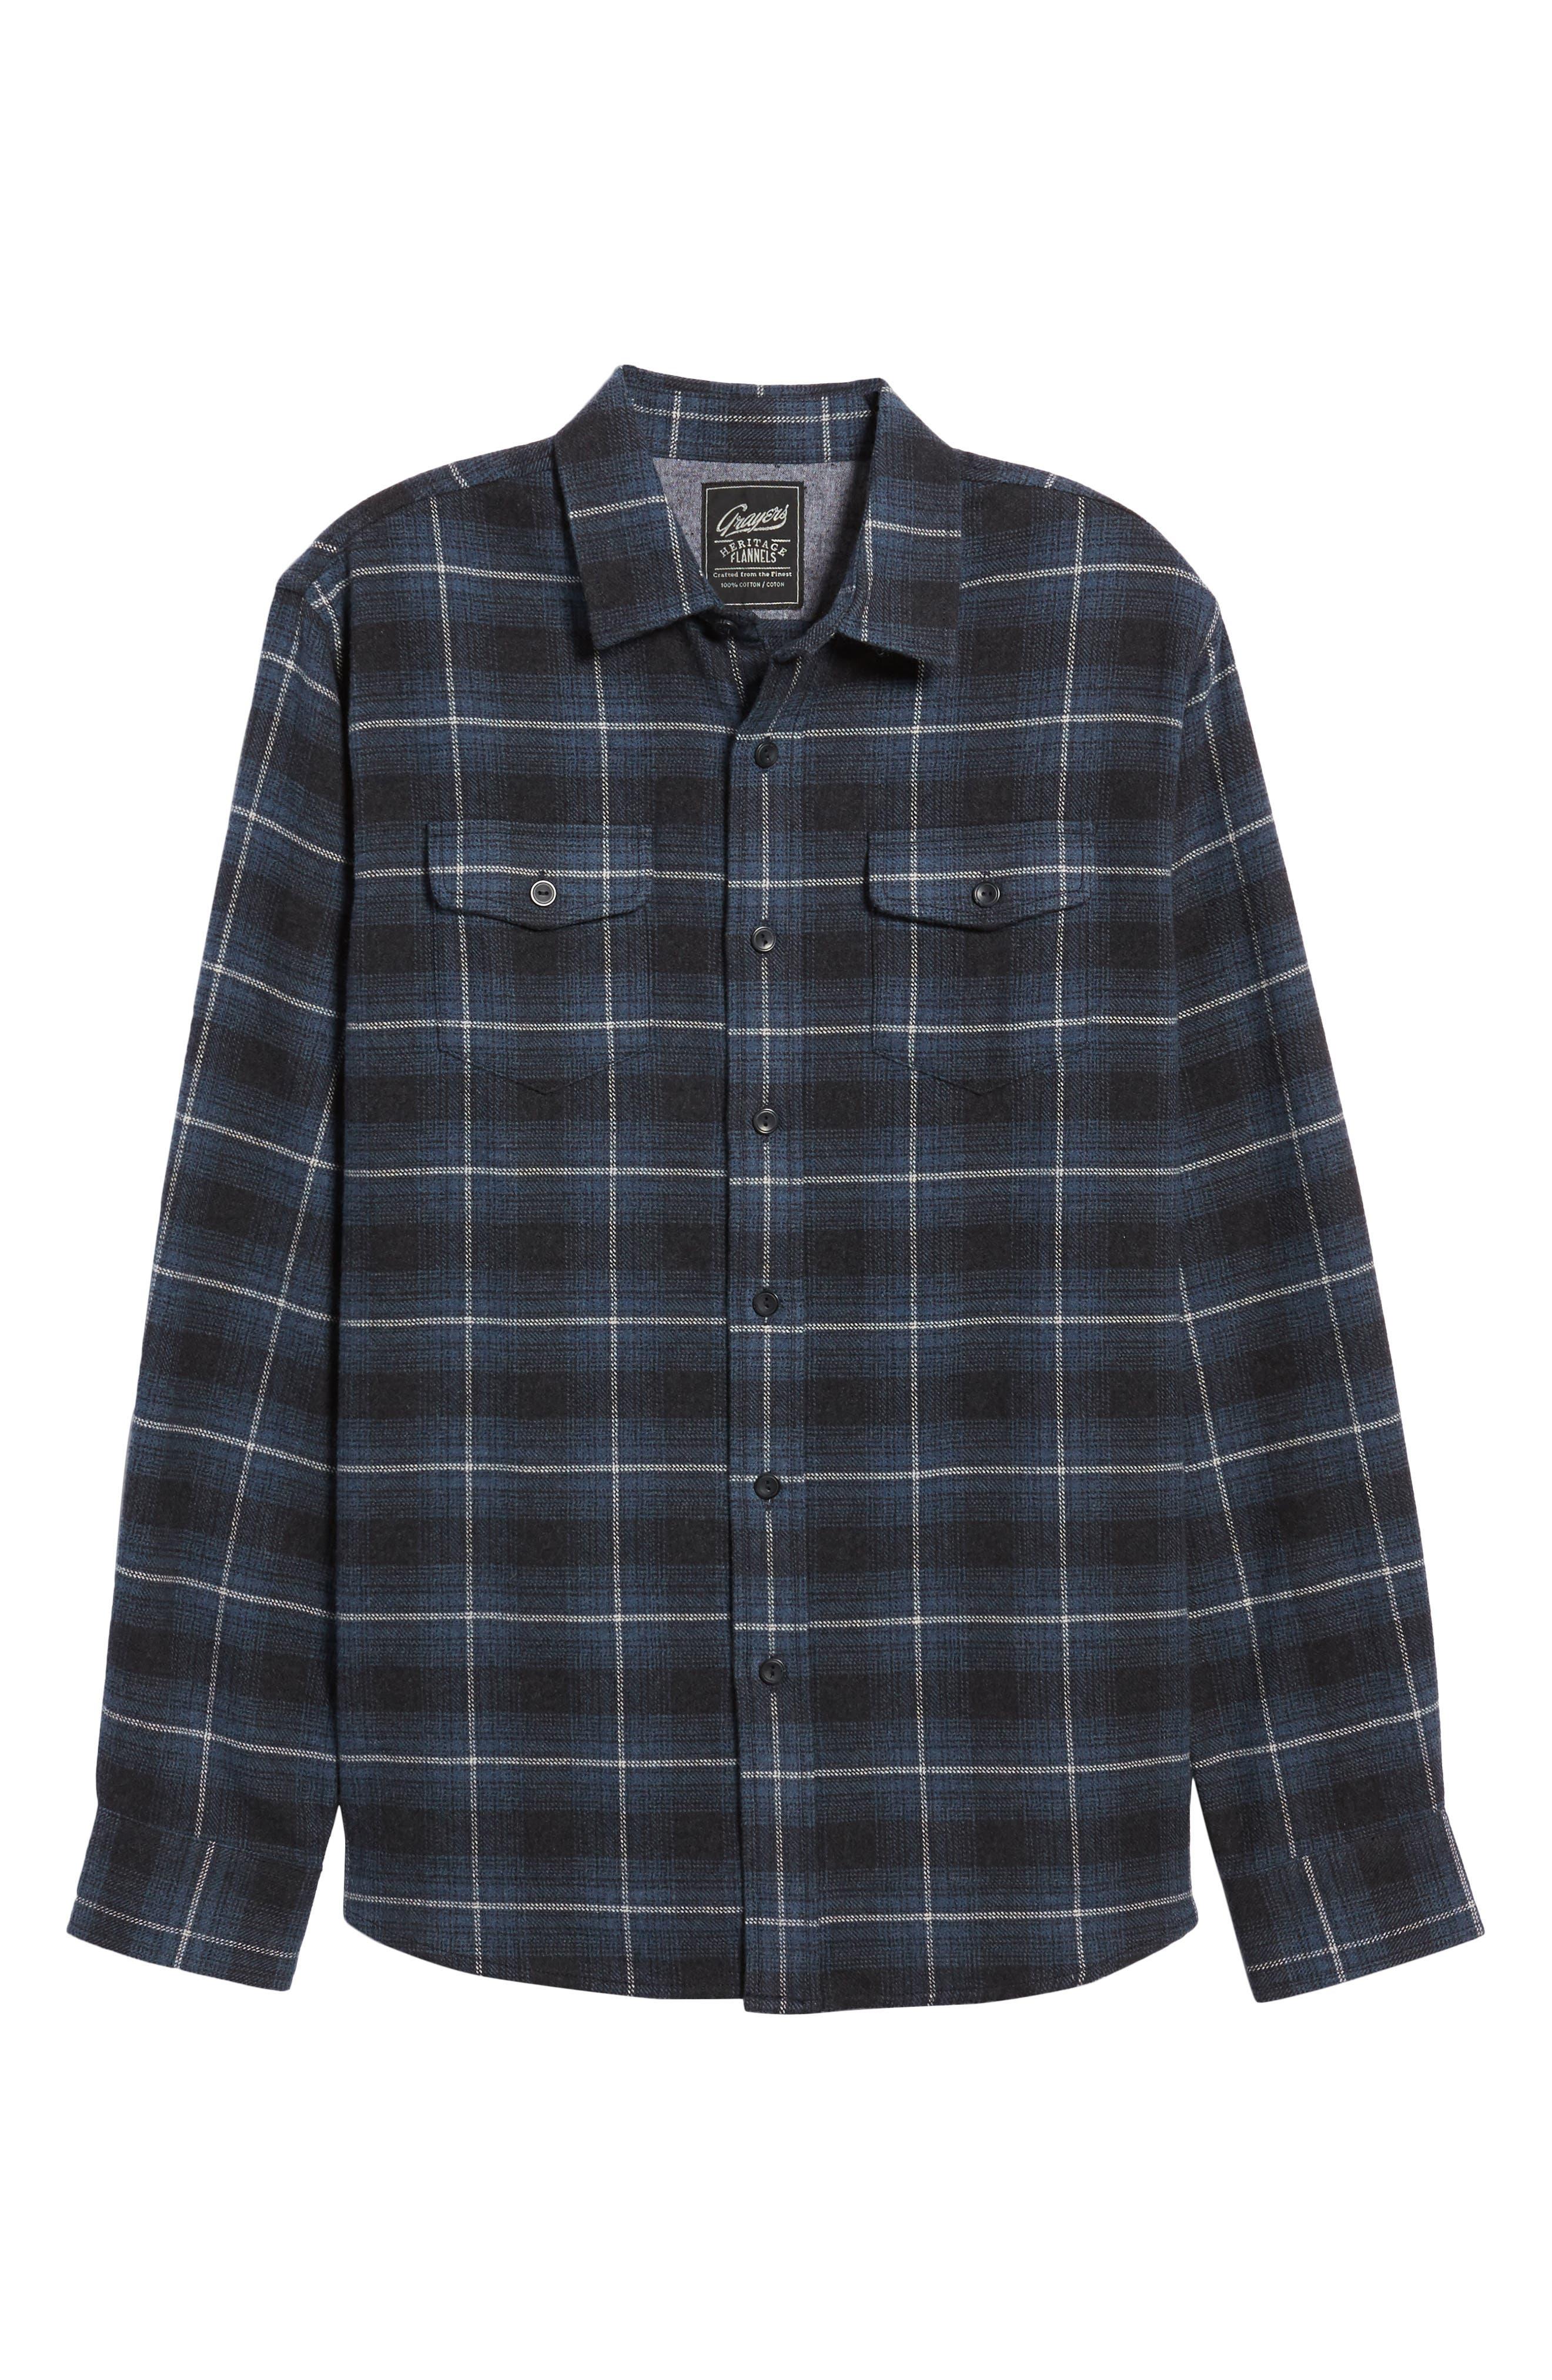 Clarke Heritage Flannel Shirt,                             Alternate thumbnail 6, color,                             Blue Charcoal